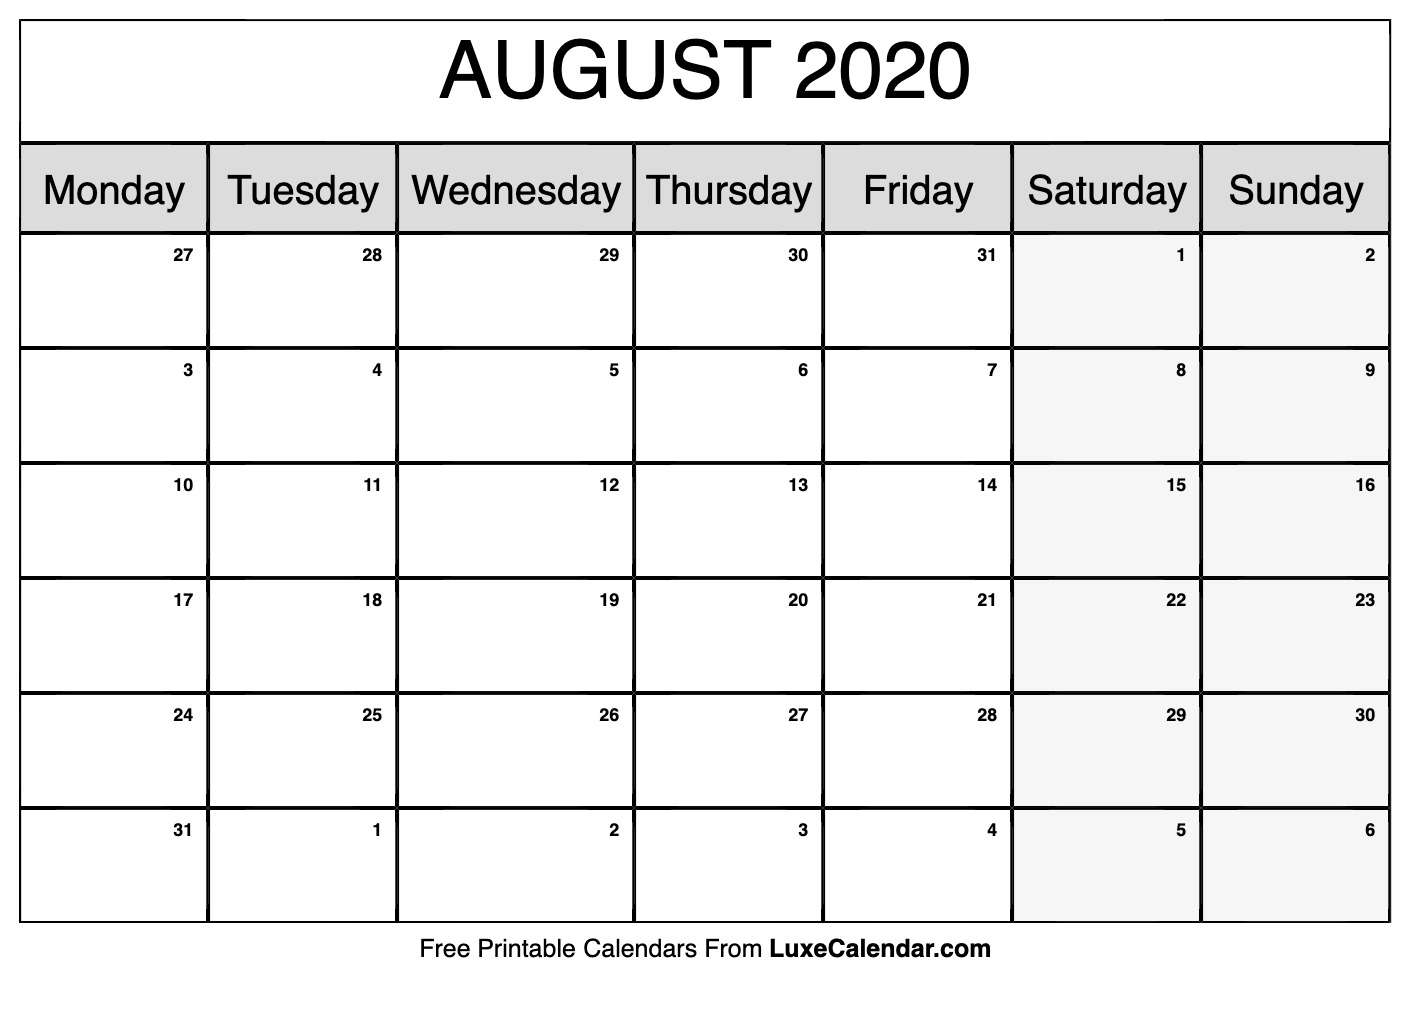 Blank August 2020 Calendar Printable - Luxe Calendar with Kid Freiendly August 2020 Calendars